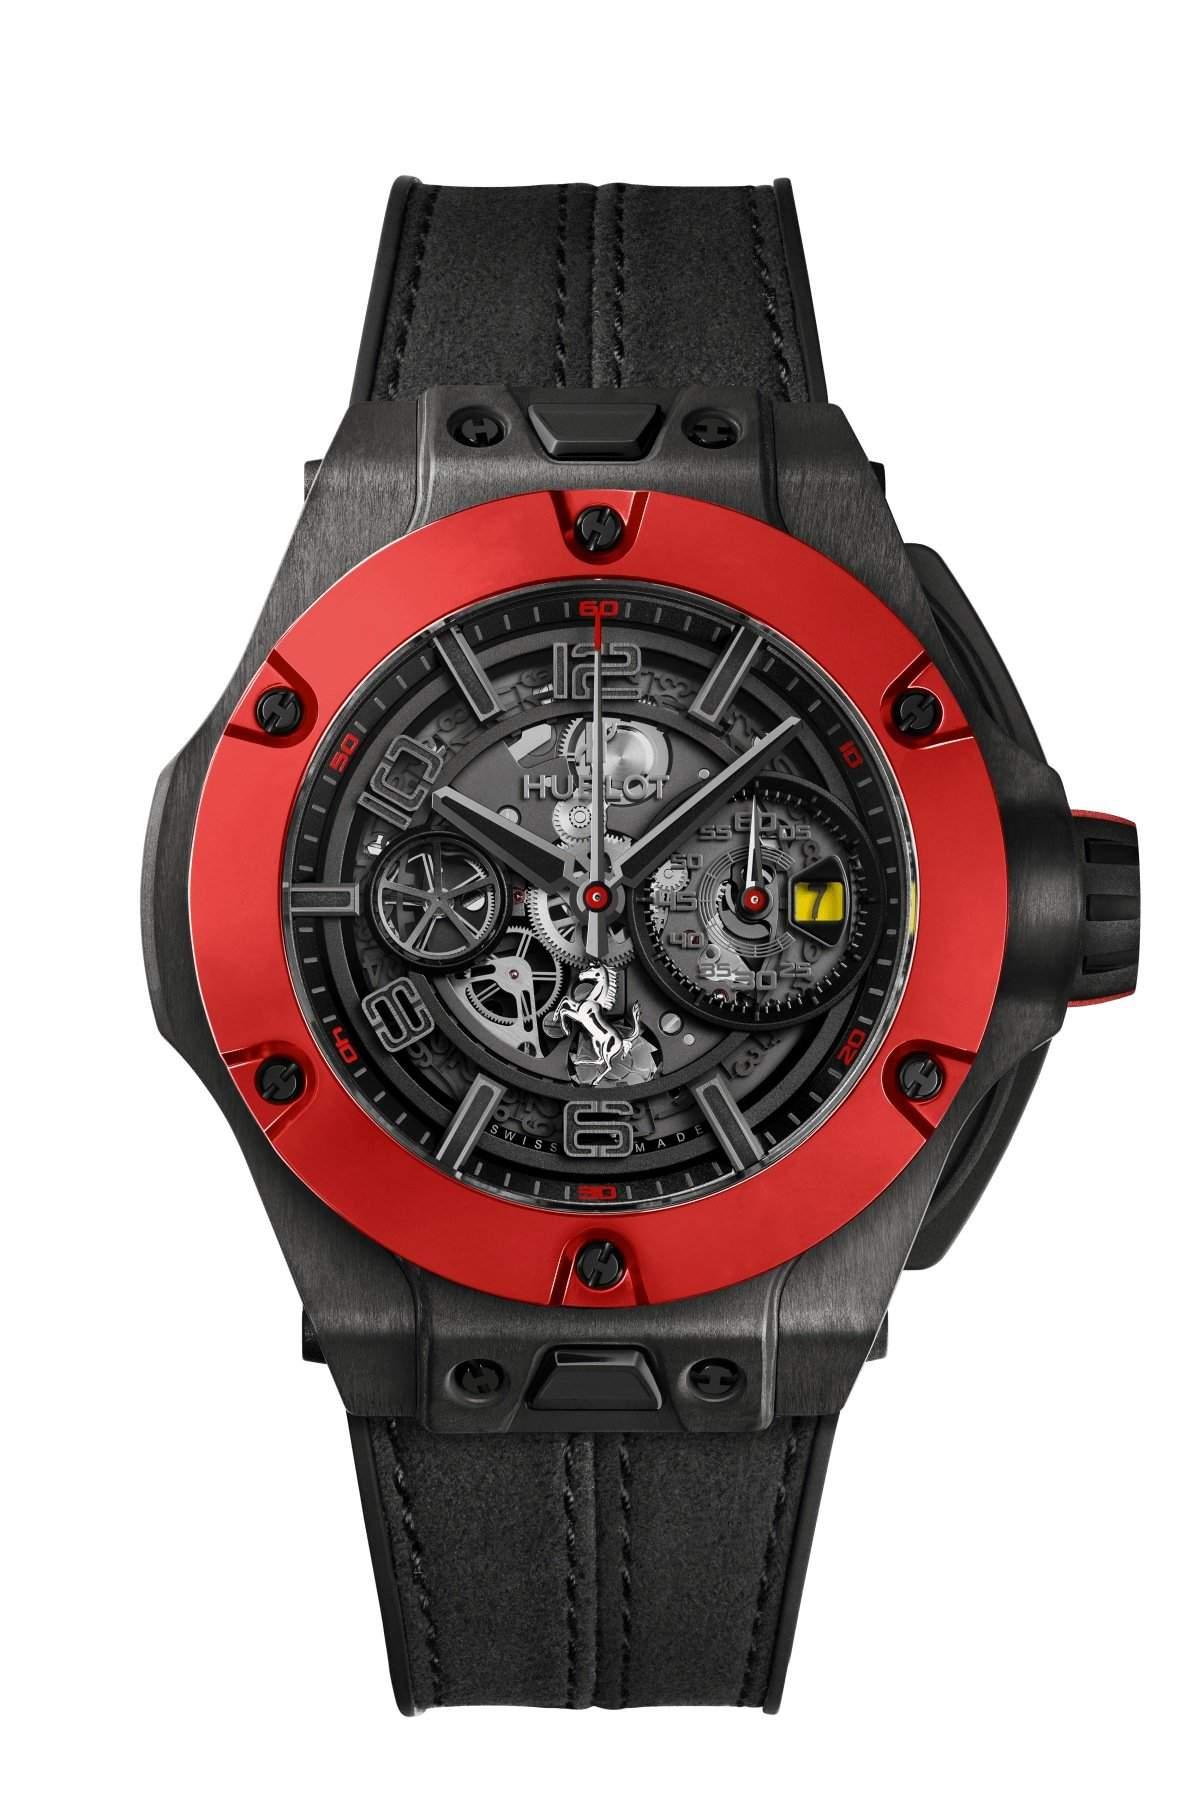 Hublot Big Bang Ferrari Unico Chronograph ref. 402.QF.0110.WR